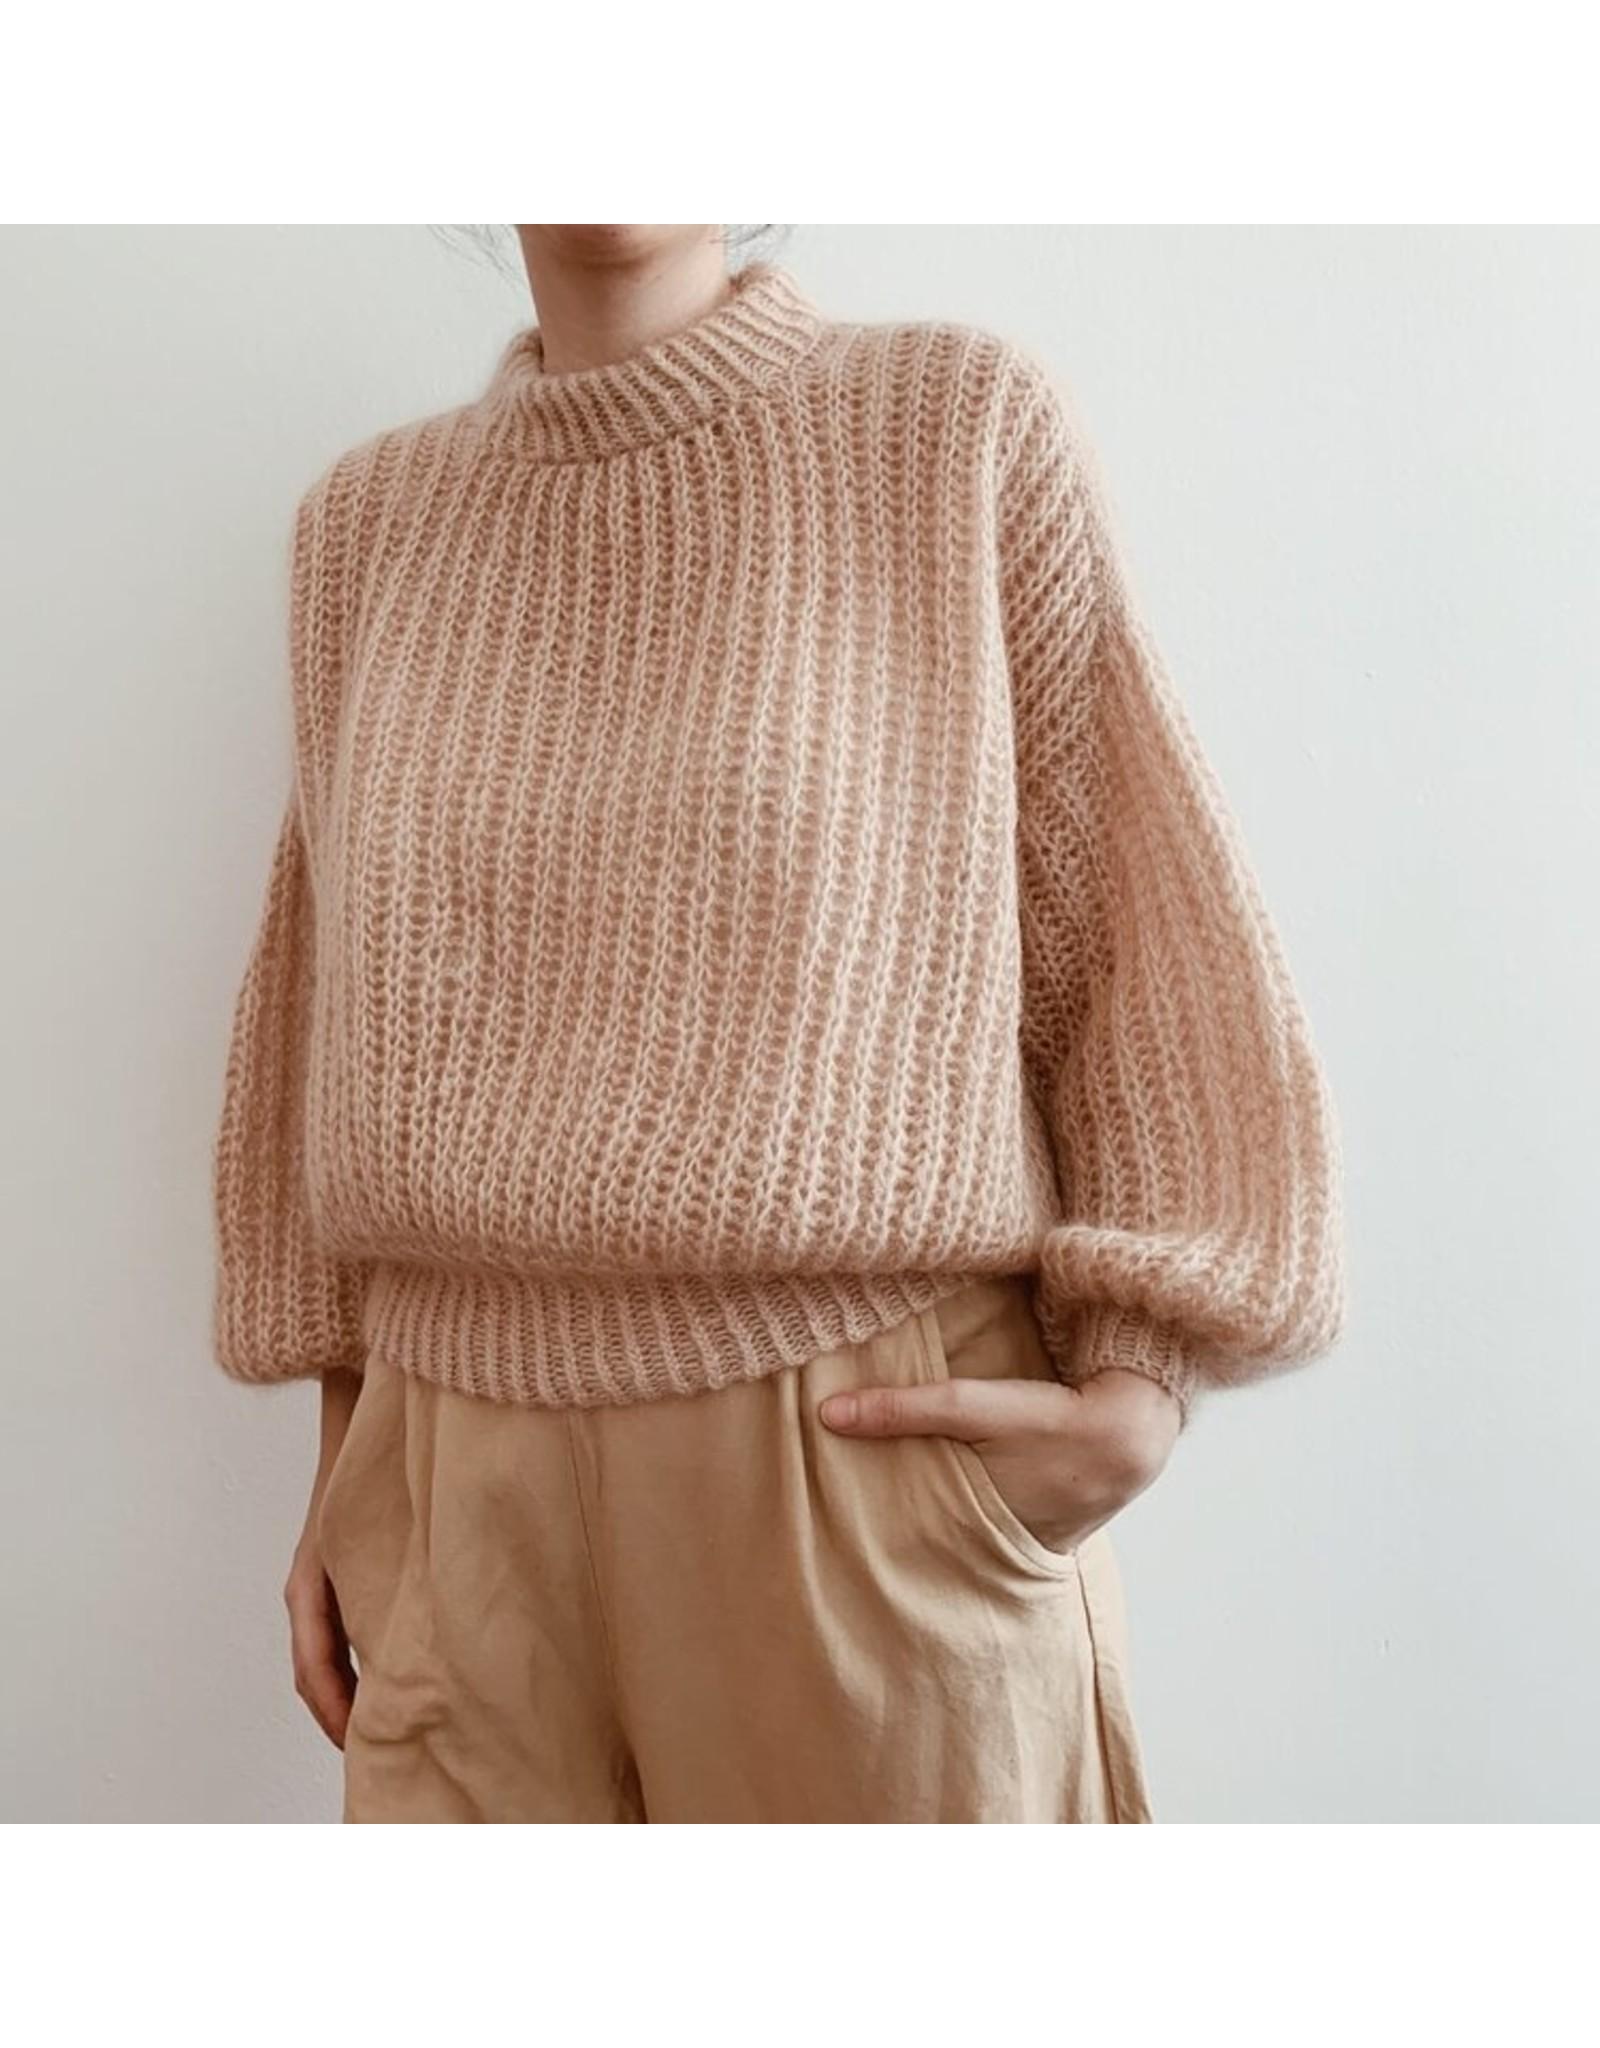 Patroon GF Tove sweater